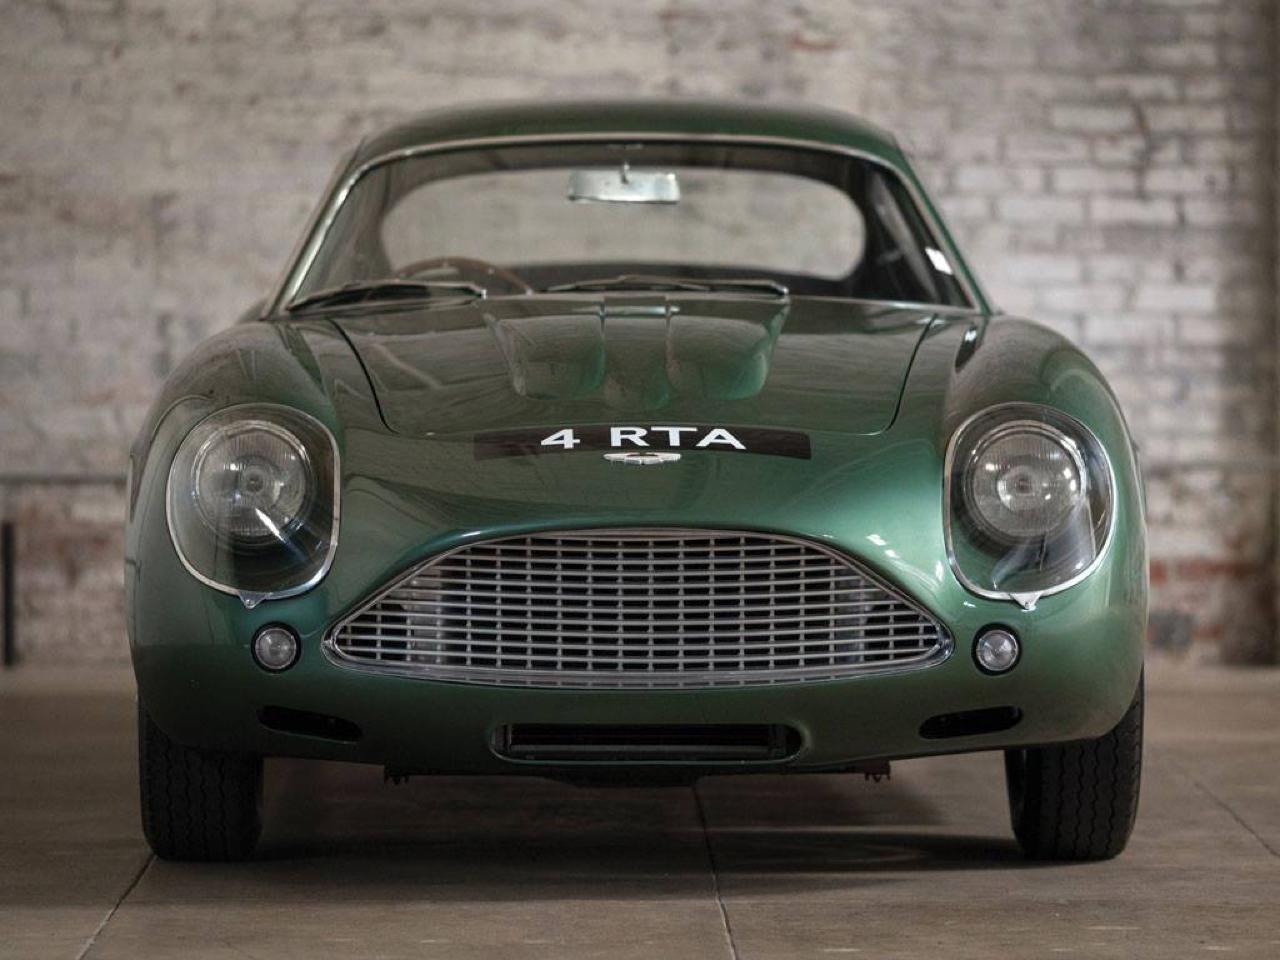 Aston Martin DB4 GT Zagato - Mangeuse de Ferrari ! 1